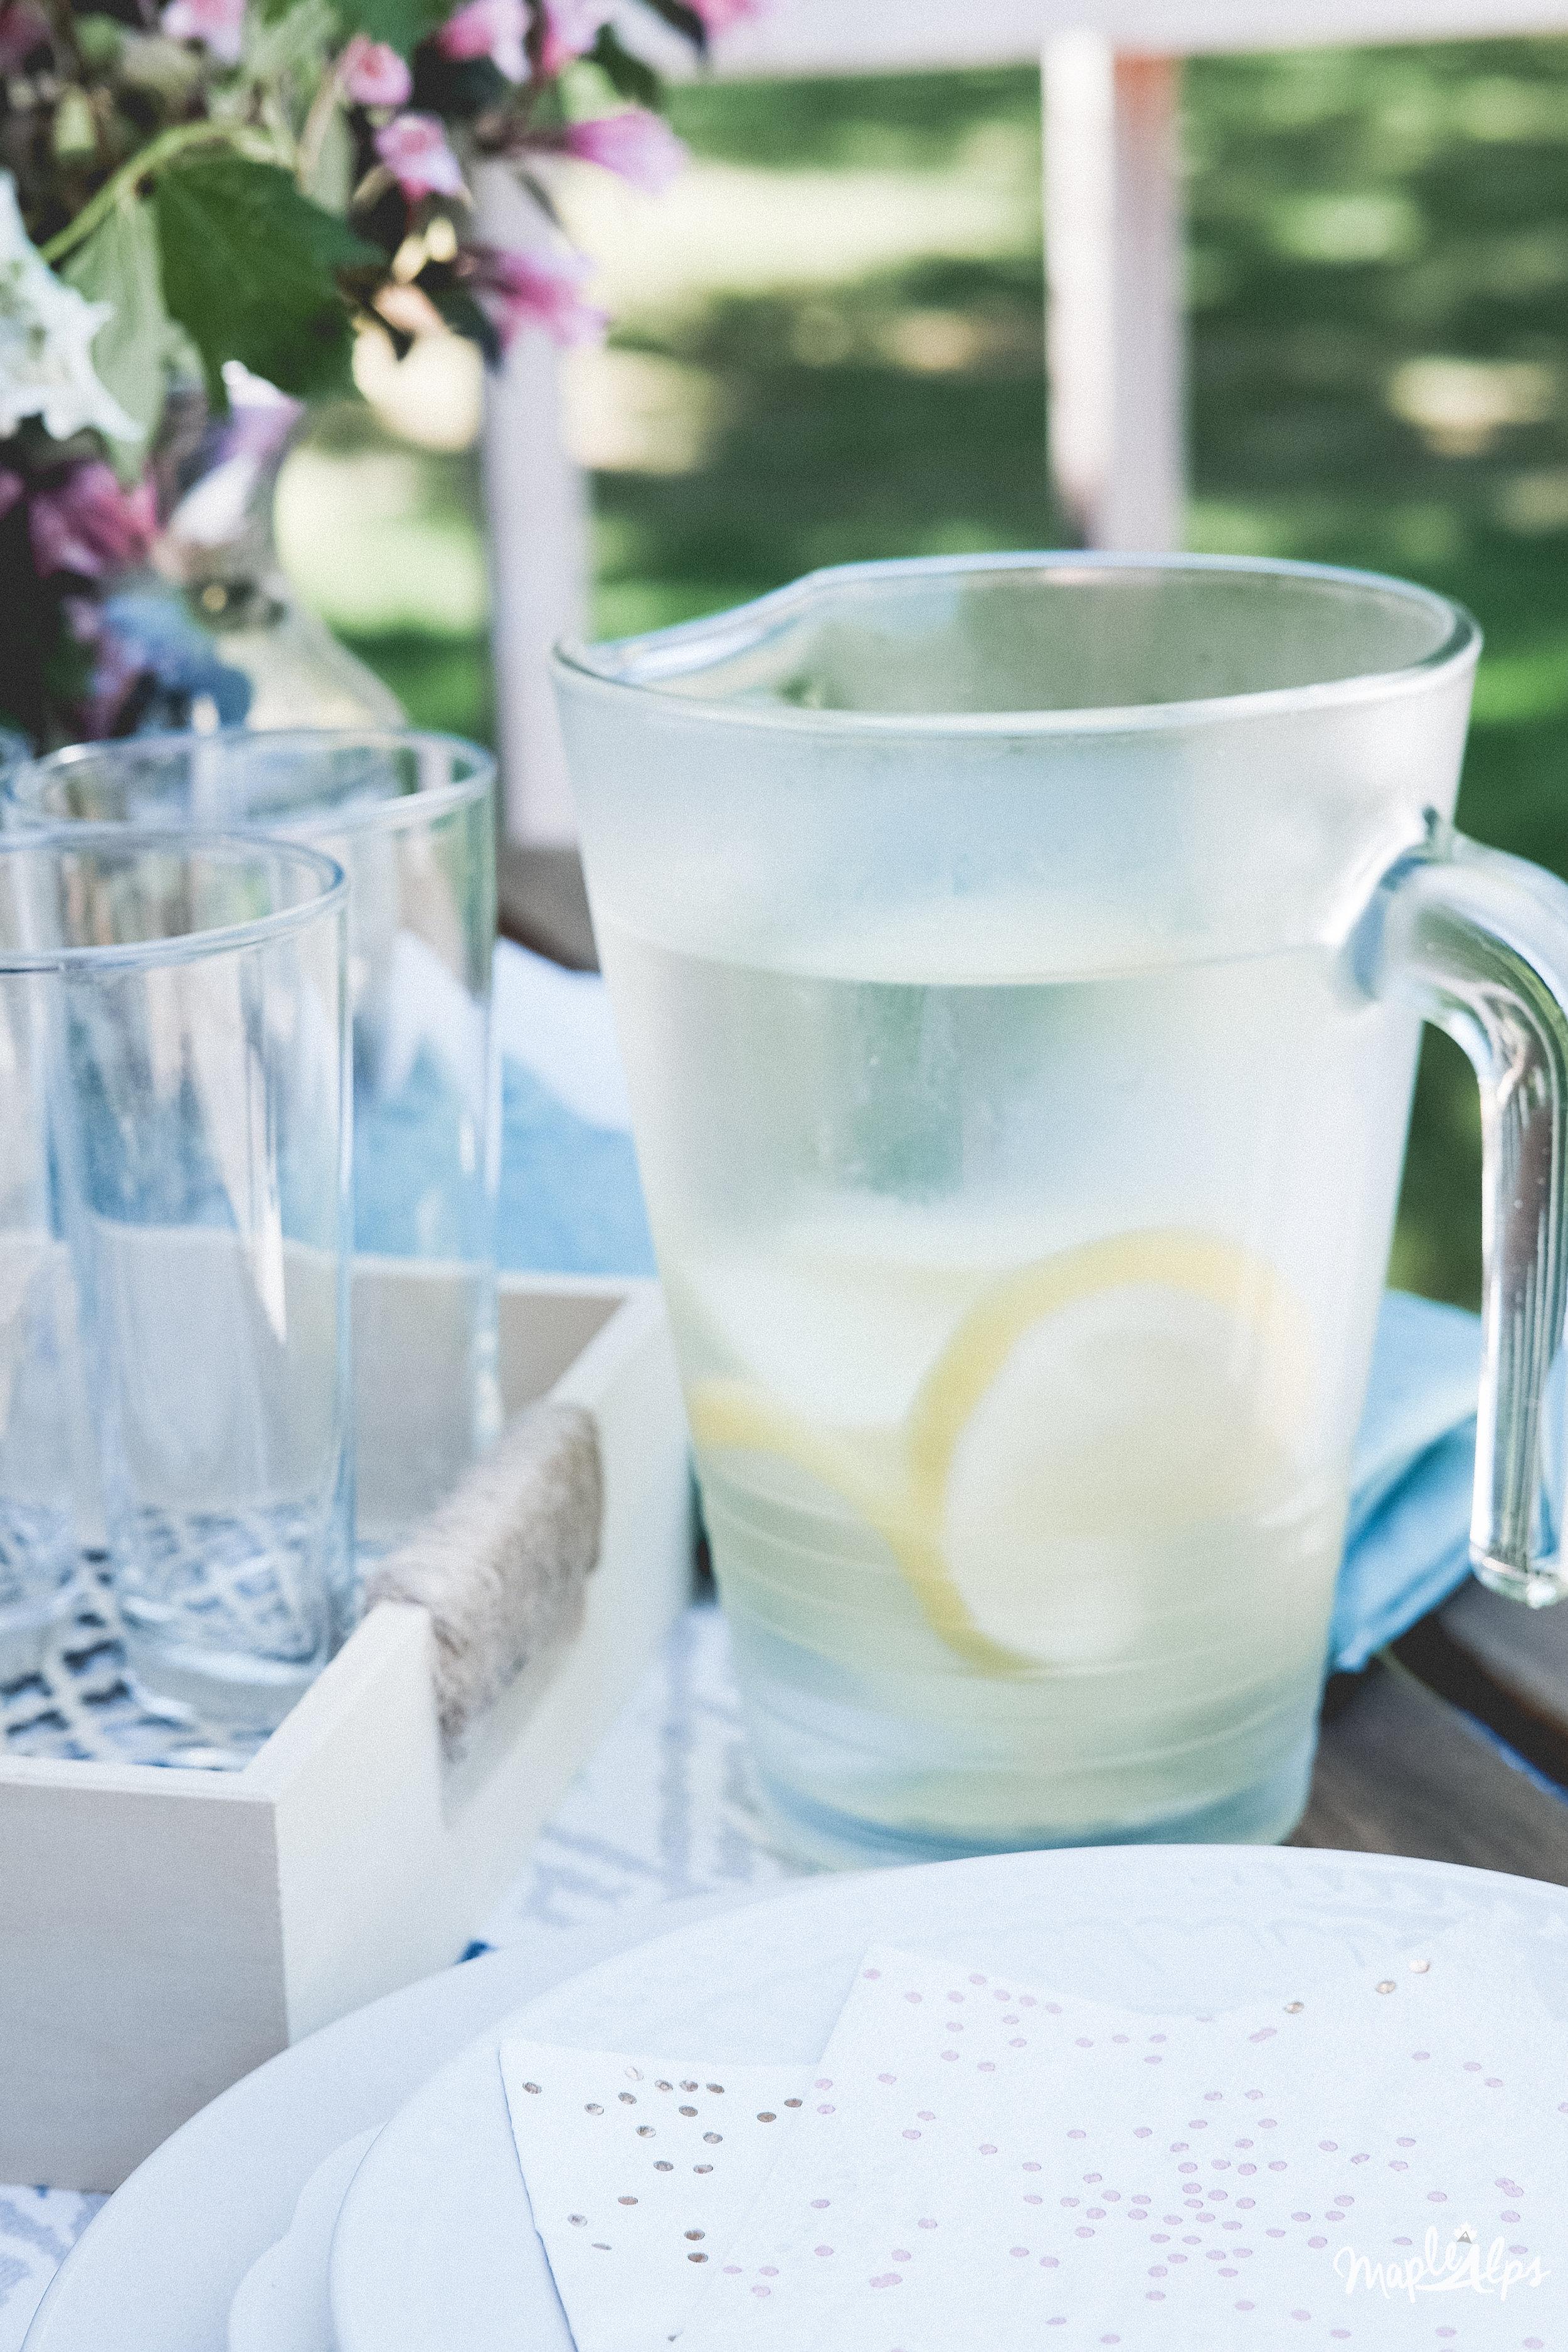 Easy Ways to Stay Hydrated | www.maplealps.com